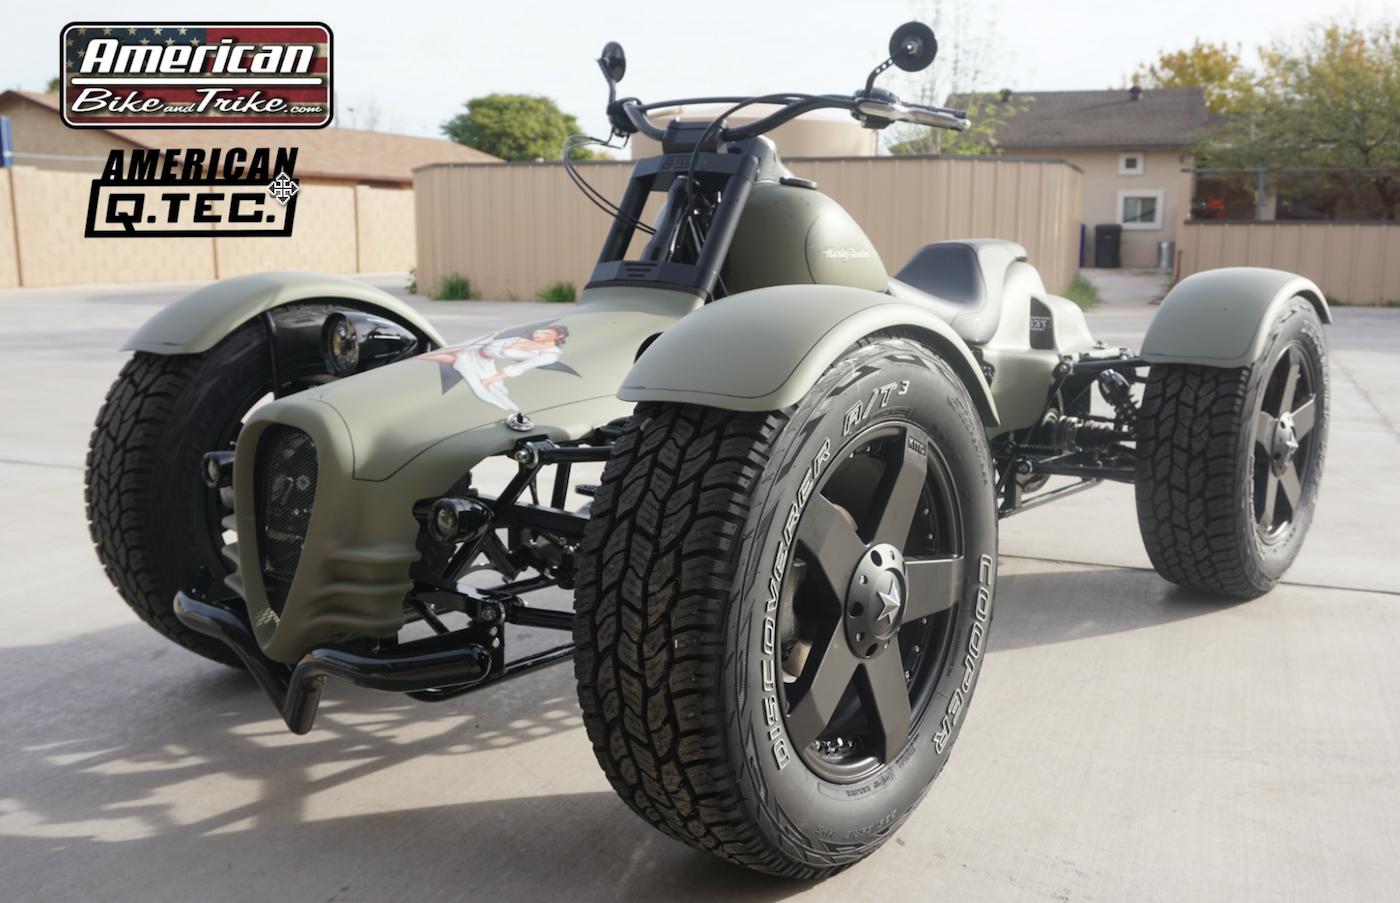 American Bike And Trike Motorcycle Conversions Trikes